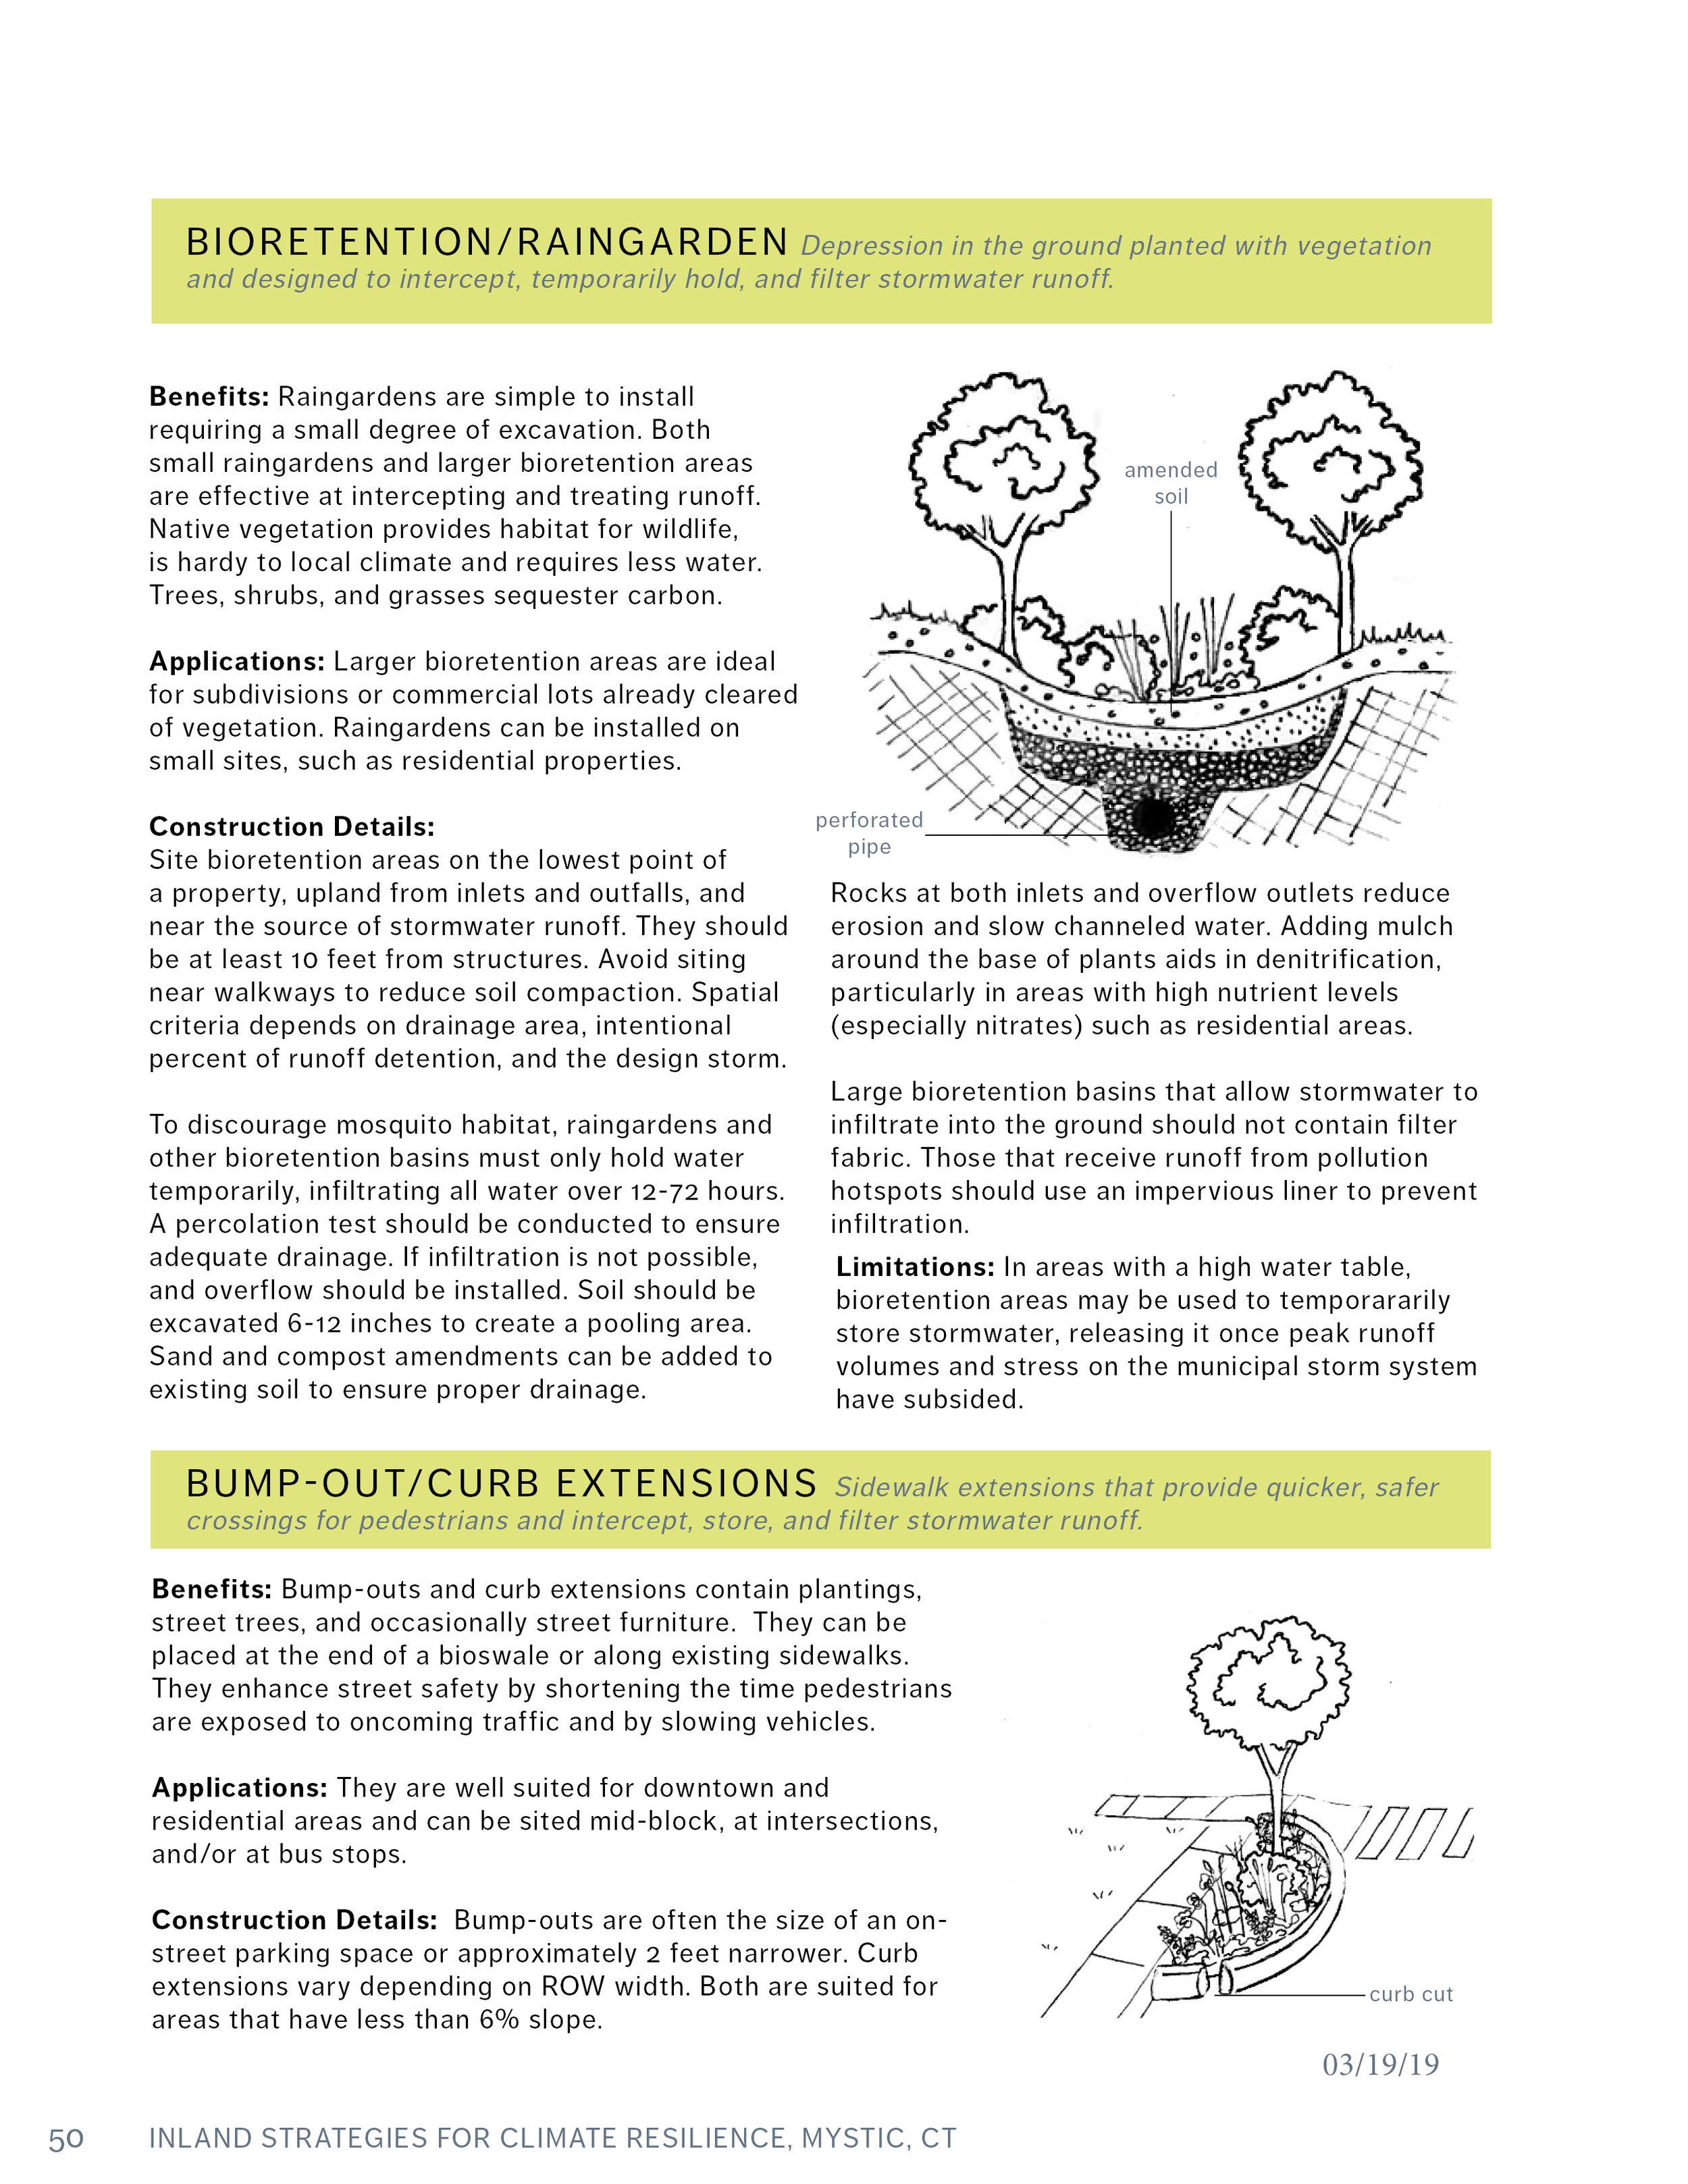 toolbox5.jpg